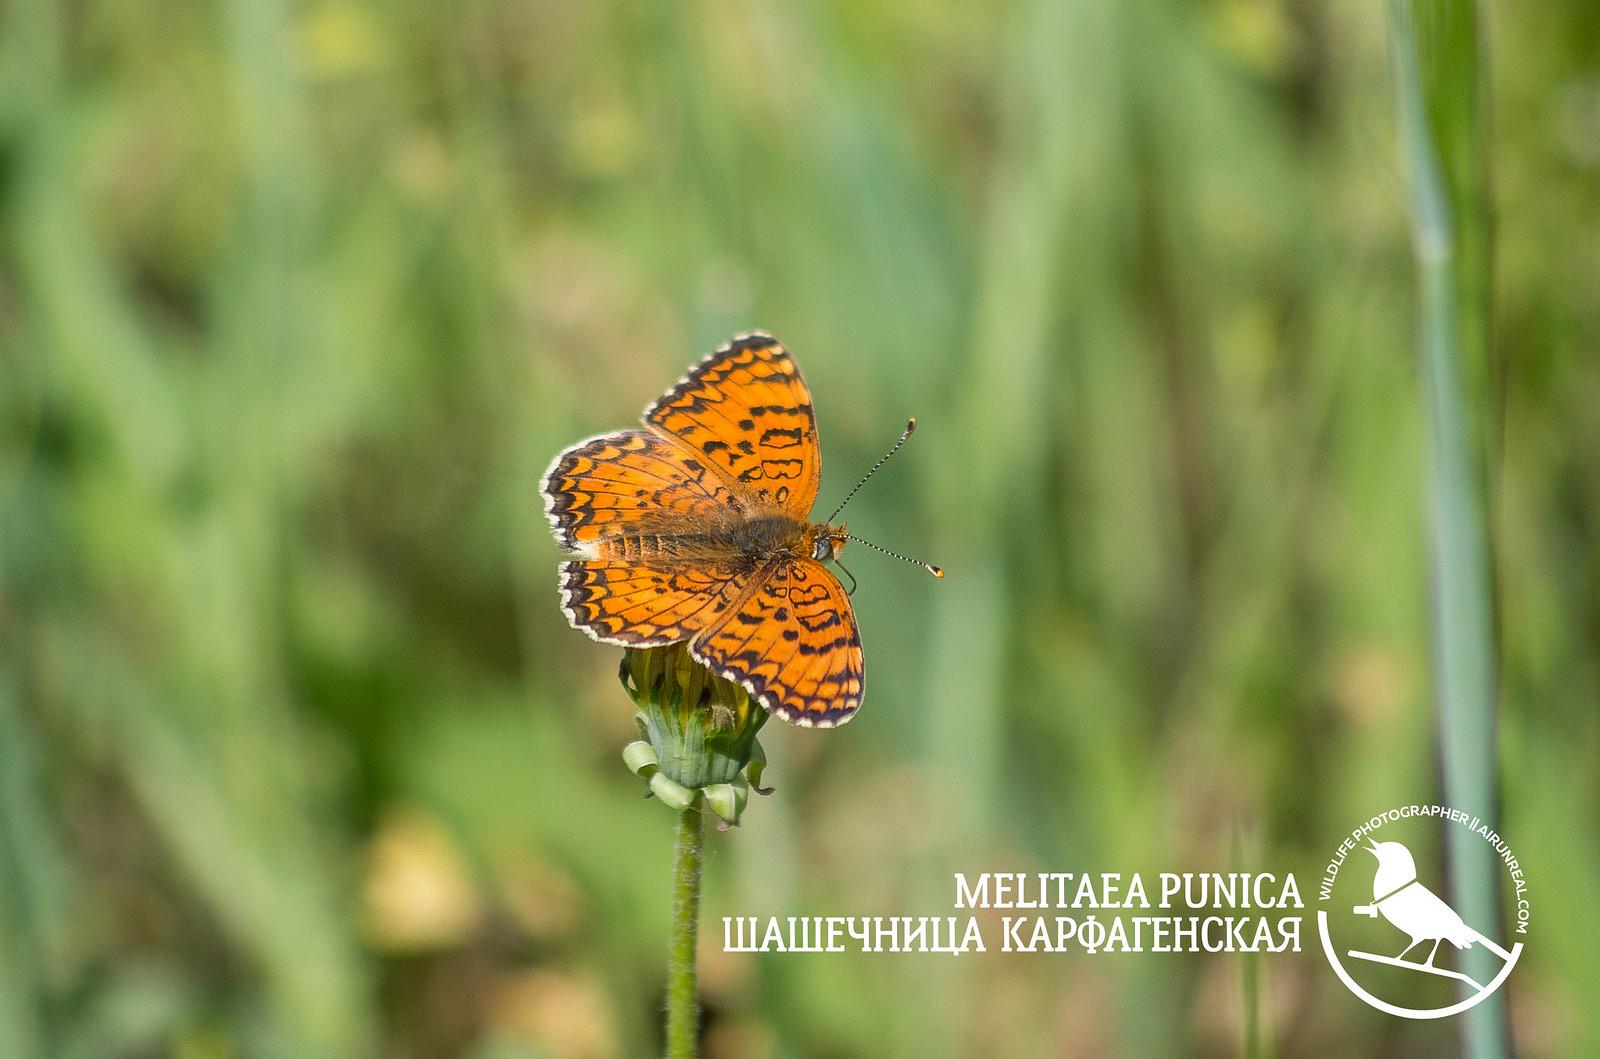 Melitaea punica // 20180522